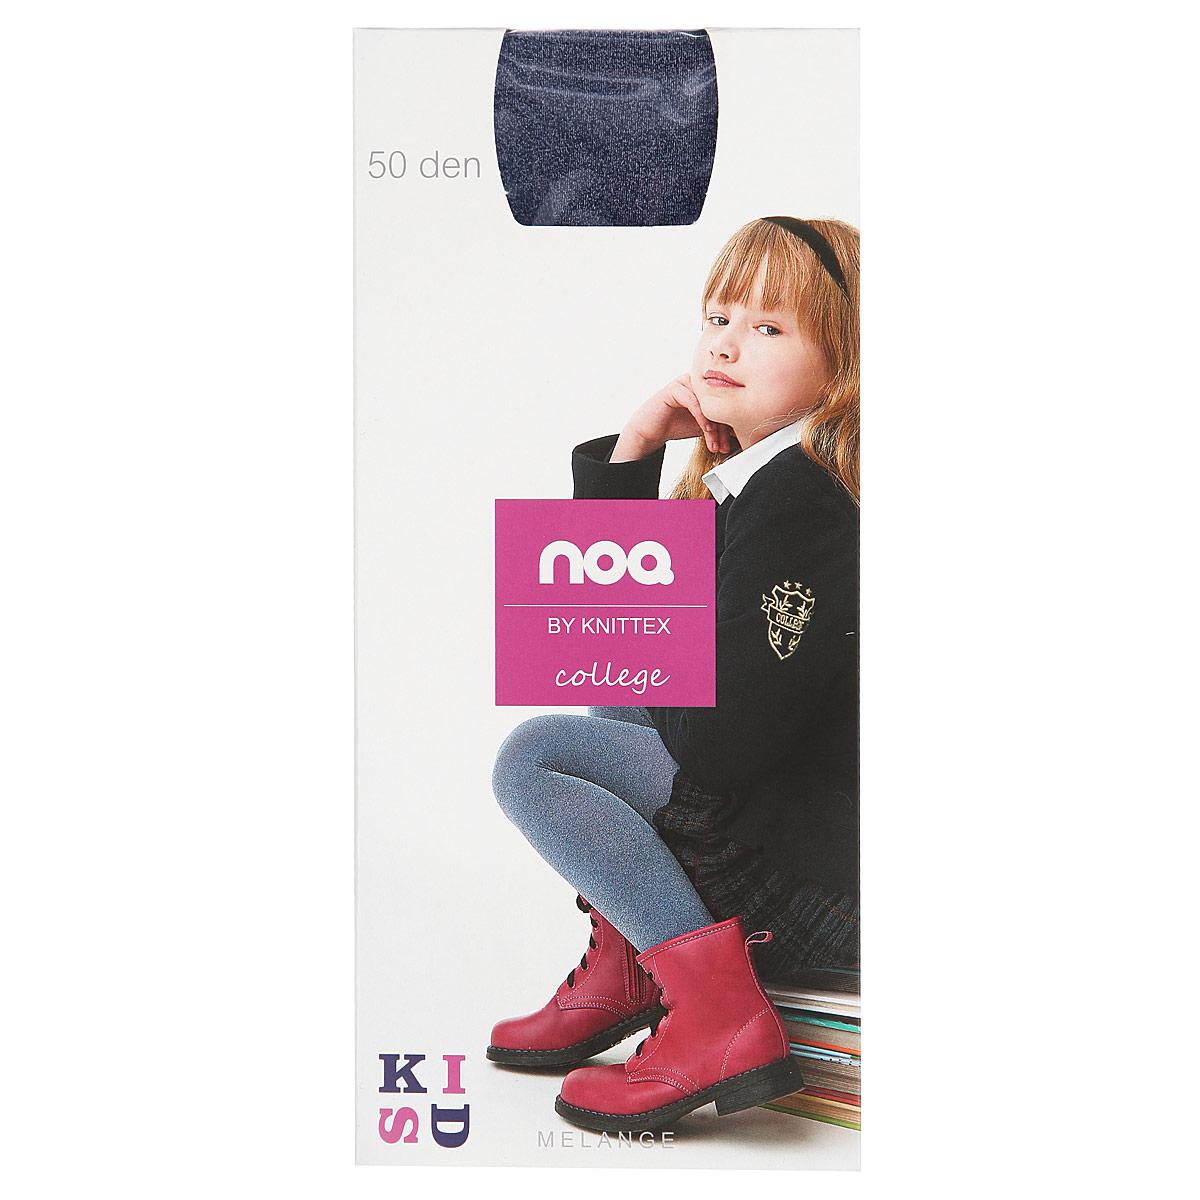 Knittex Колготки для девочки Noo College